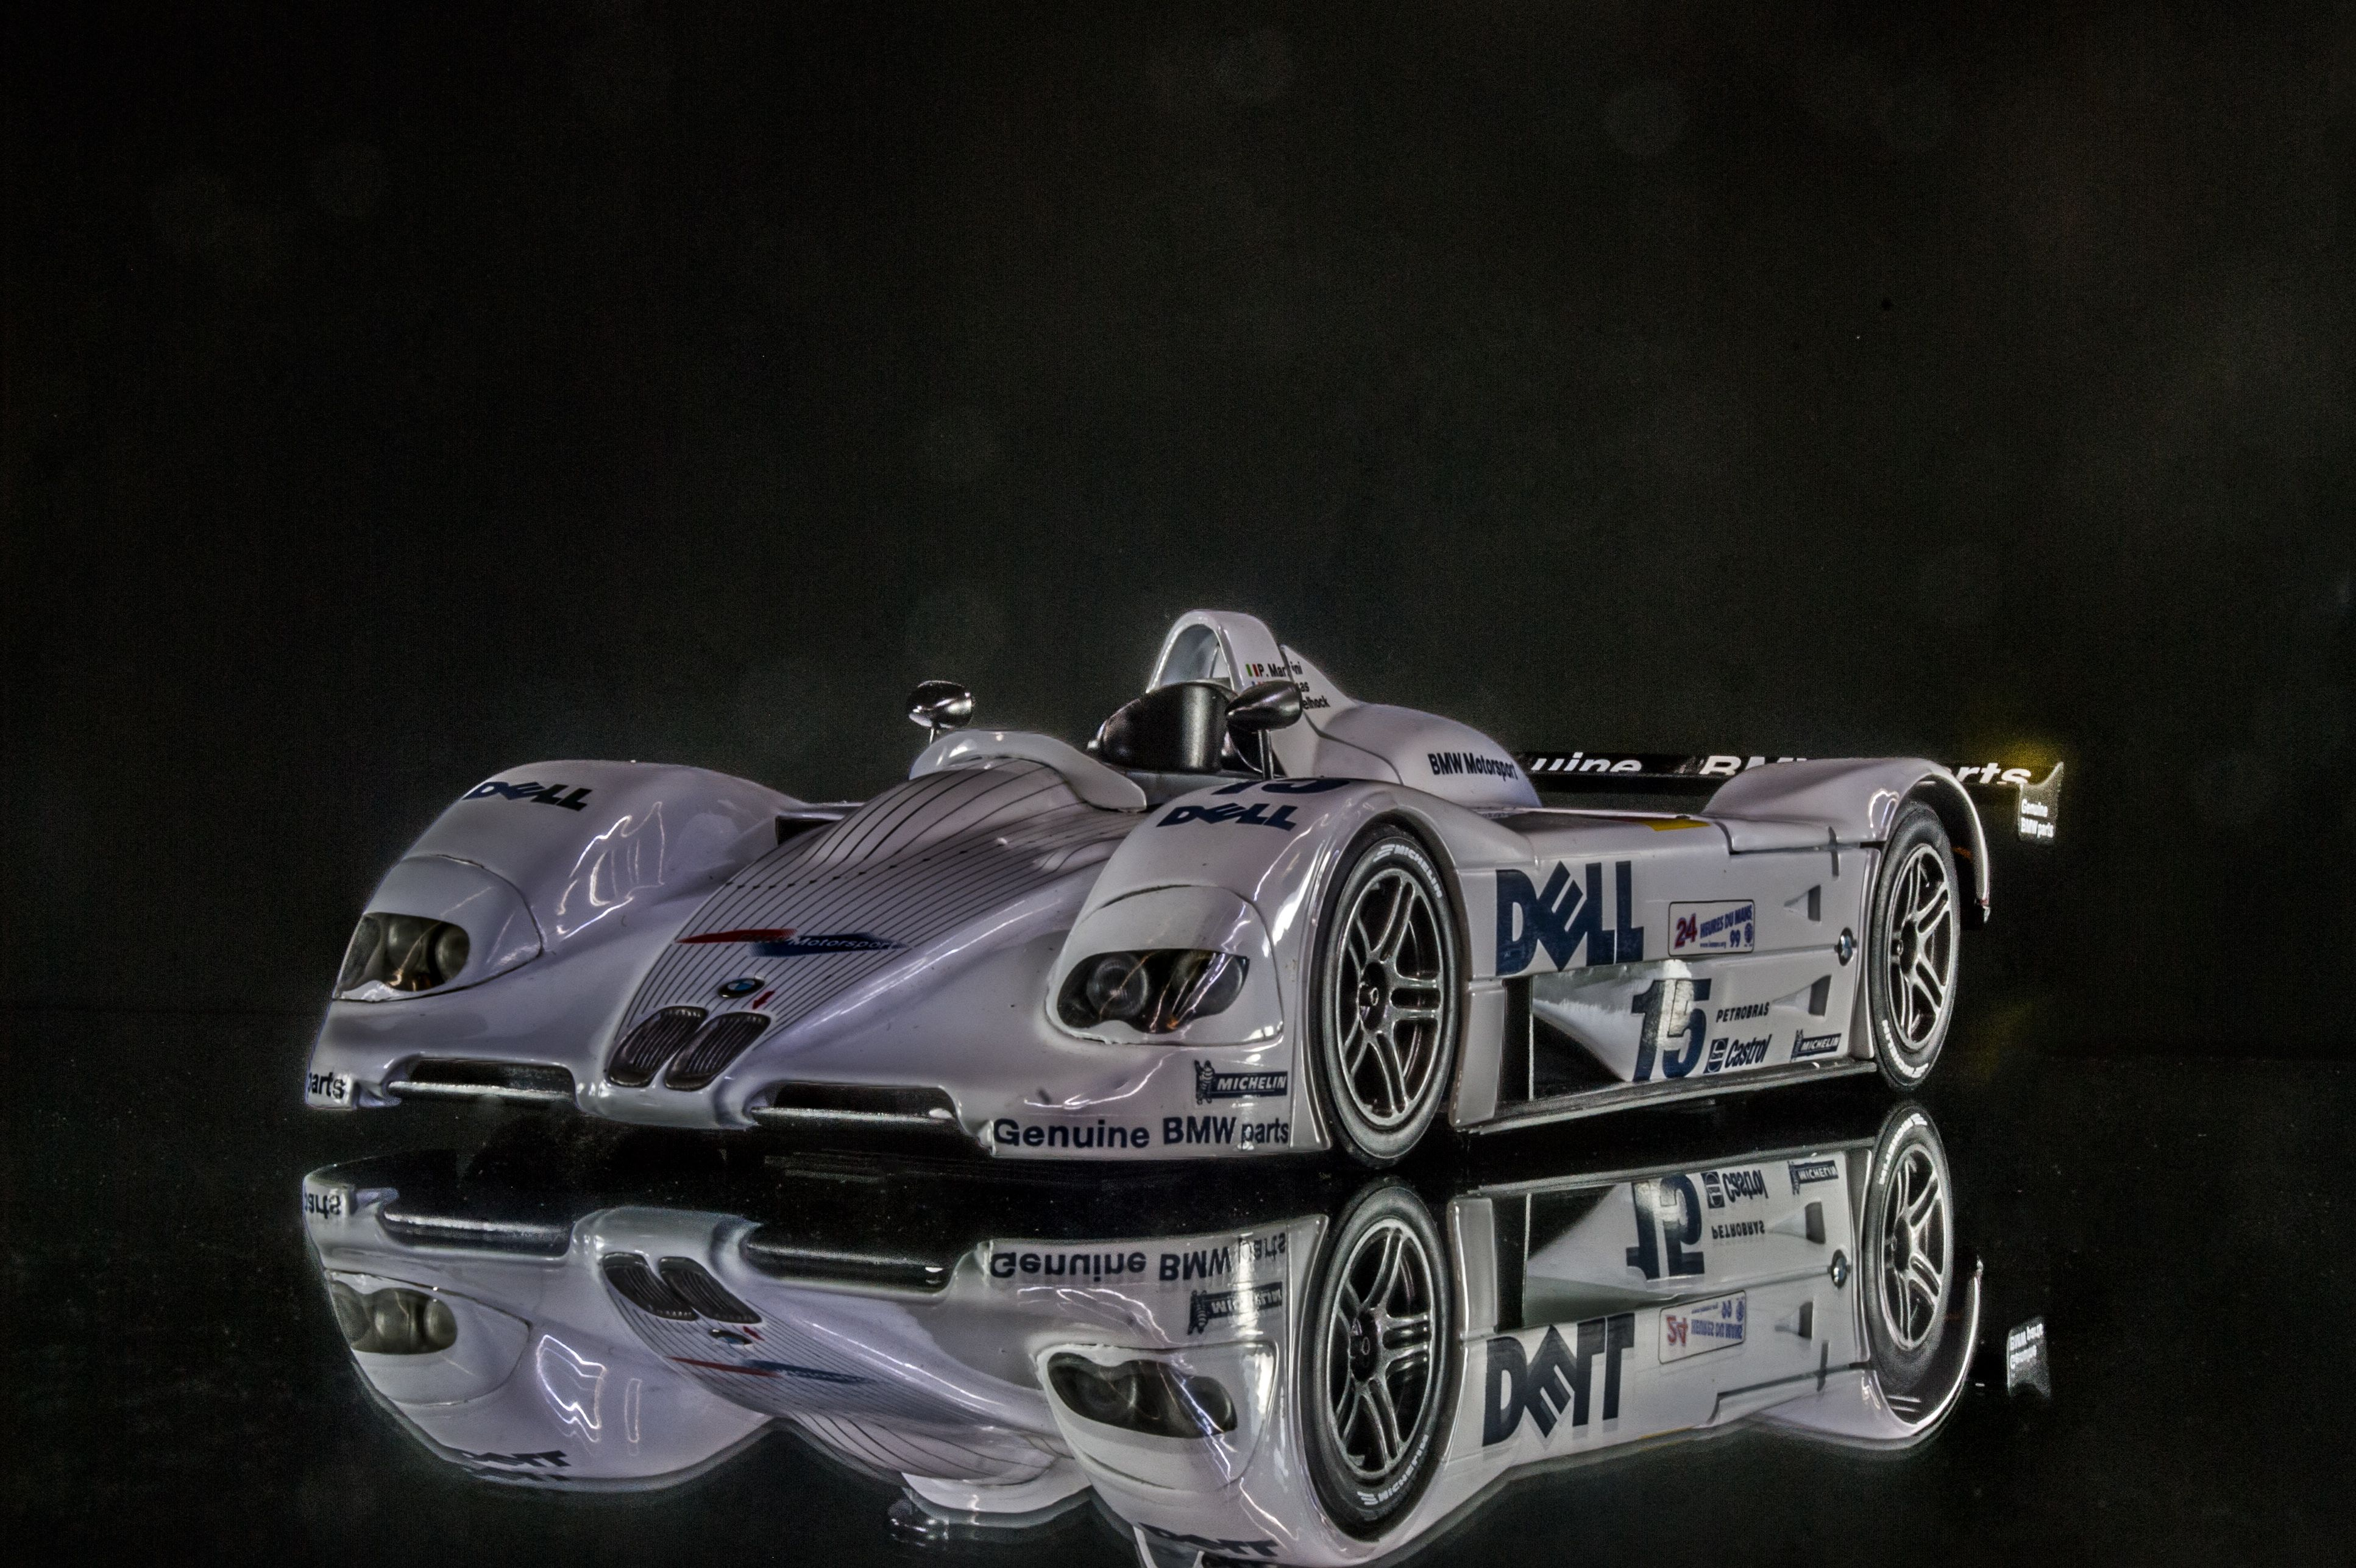 a7c8aa86265f947b8b715ad3042079e1 Outstanding Maisto Porsche 911 Gt1 Le Mans 1998 Cars Trend